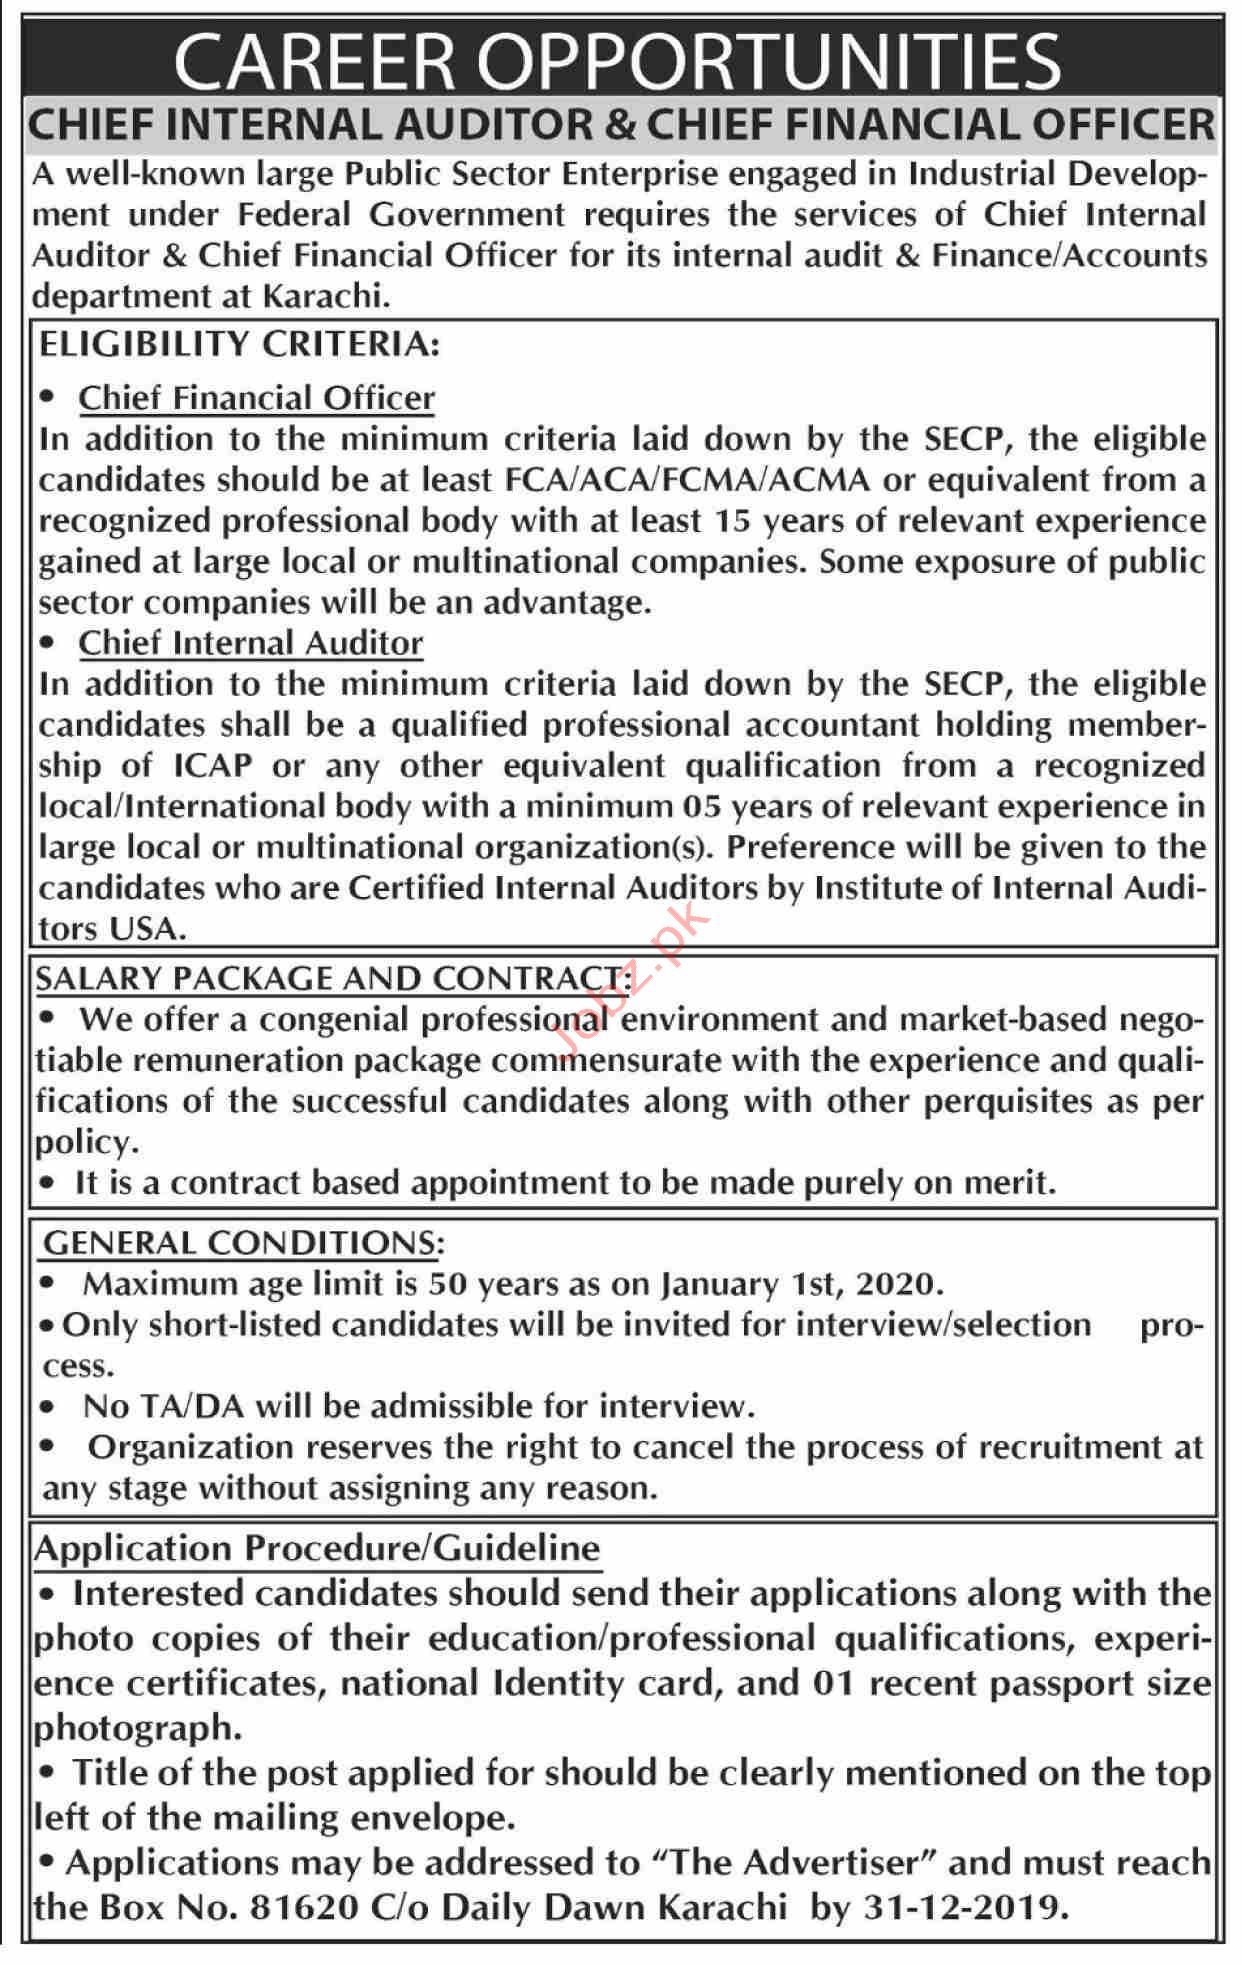 FG Public Sector Organization Jobs in Karachi